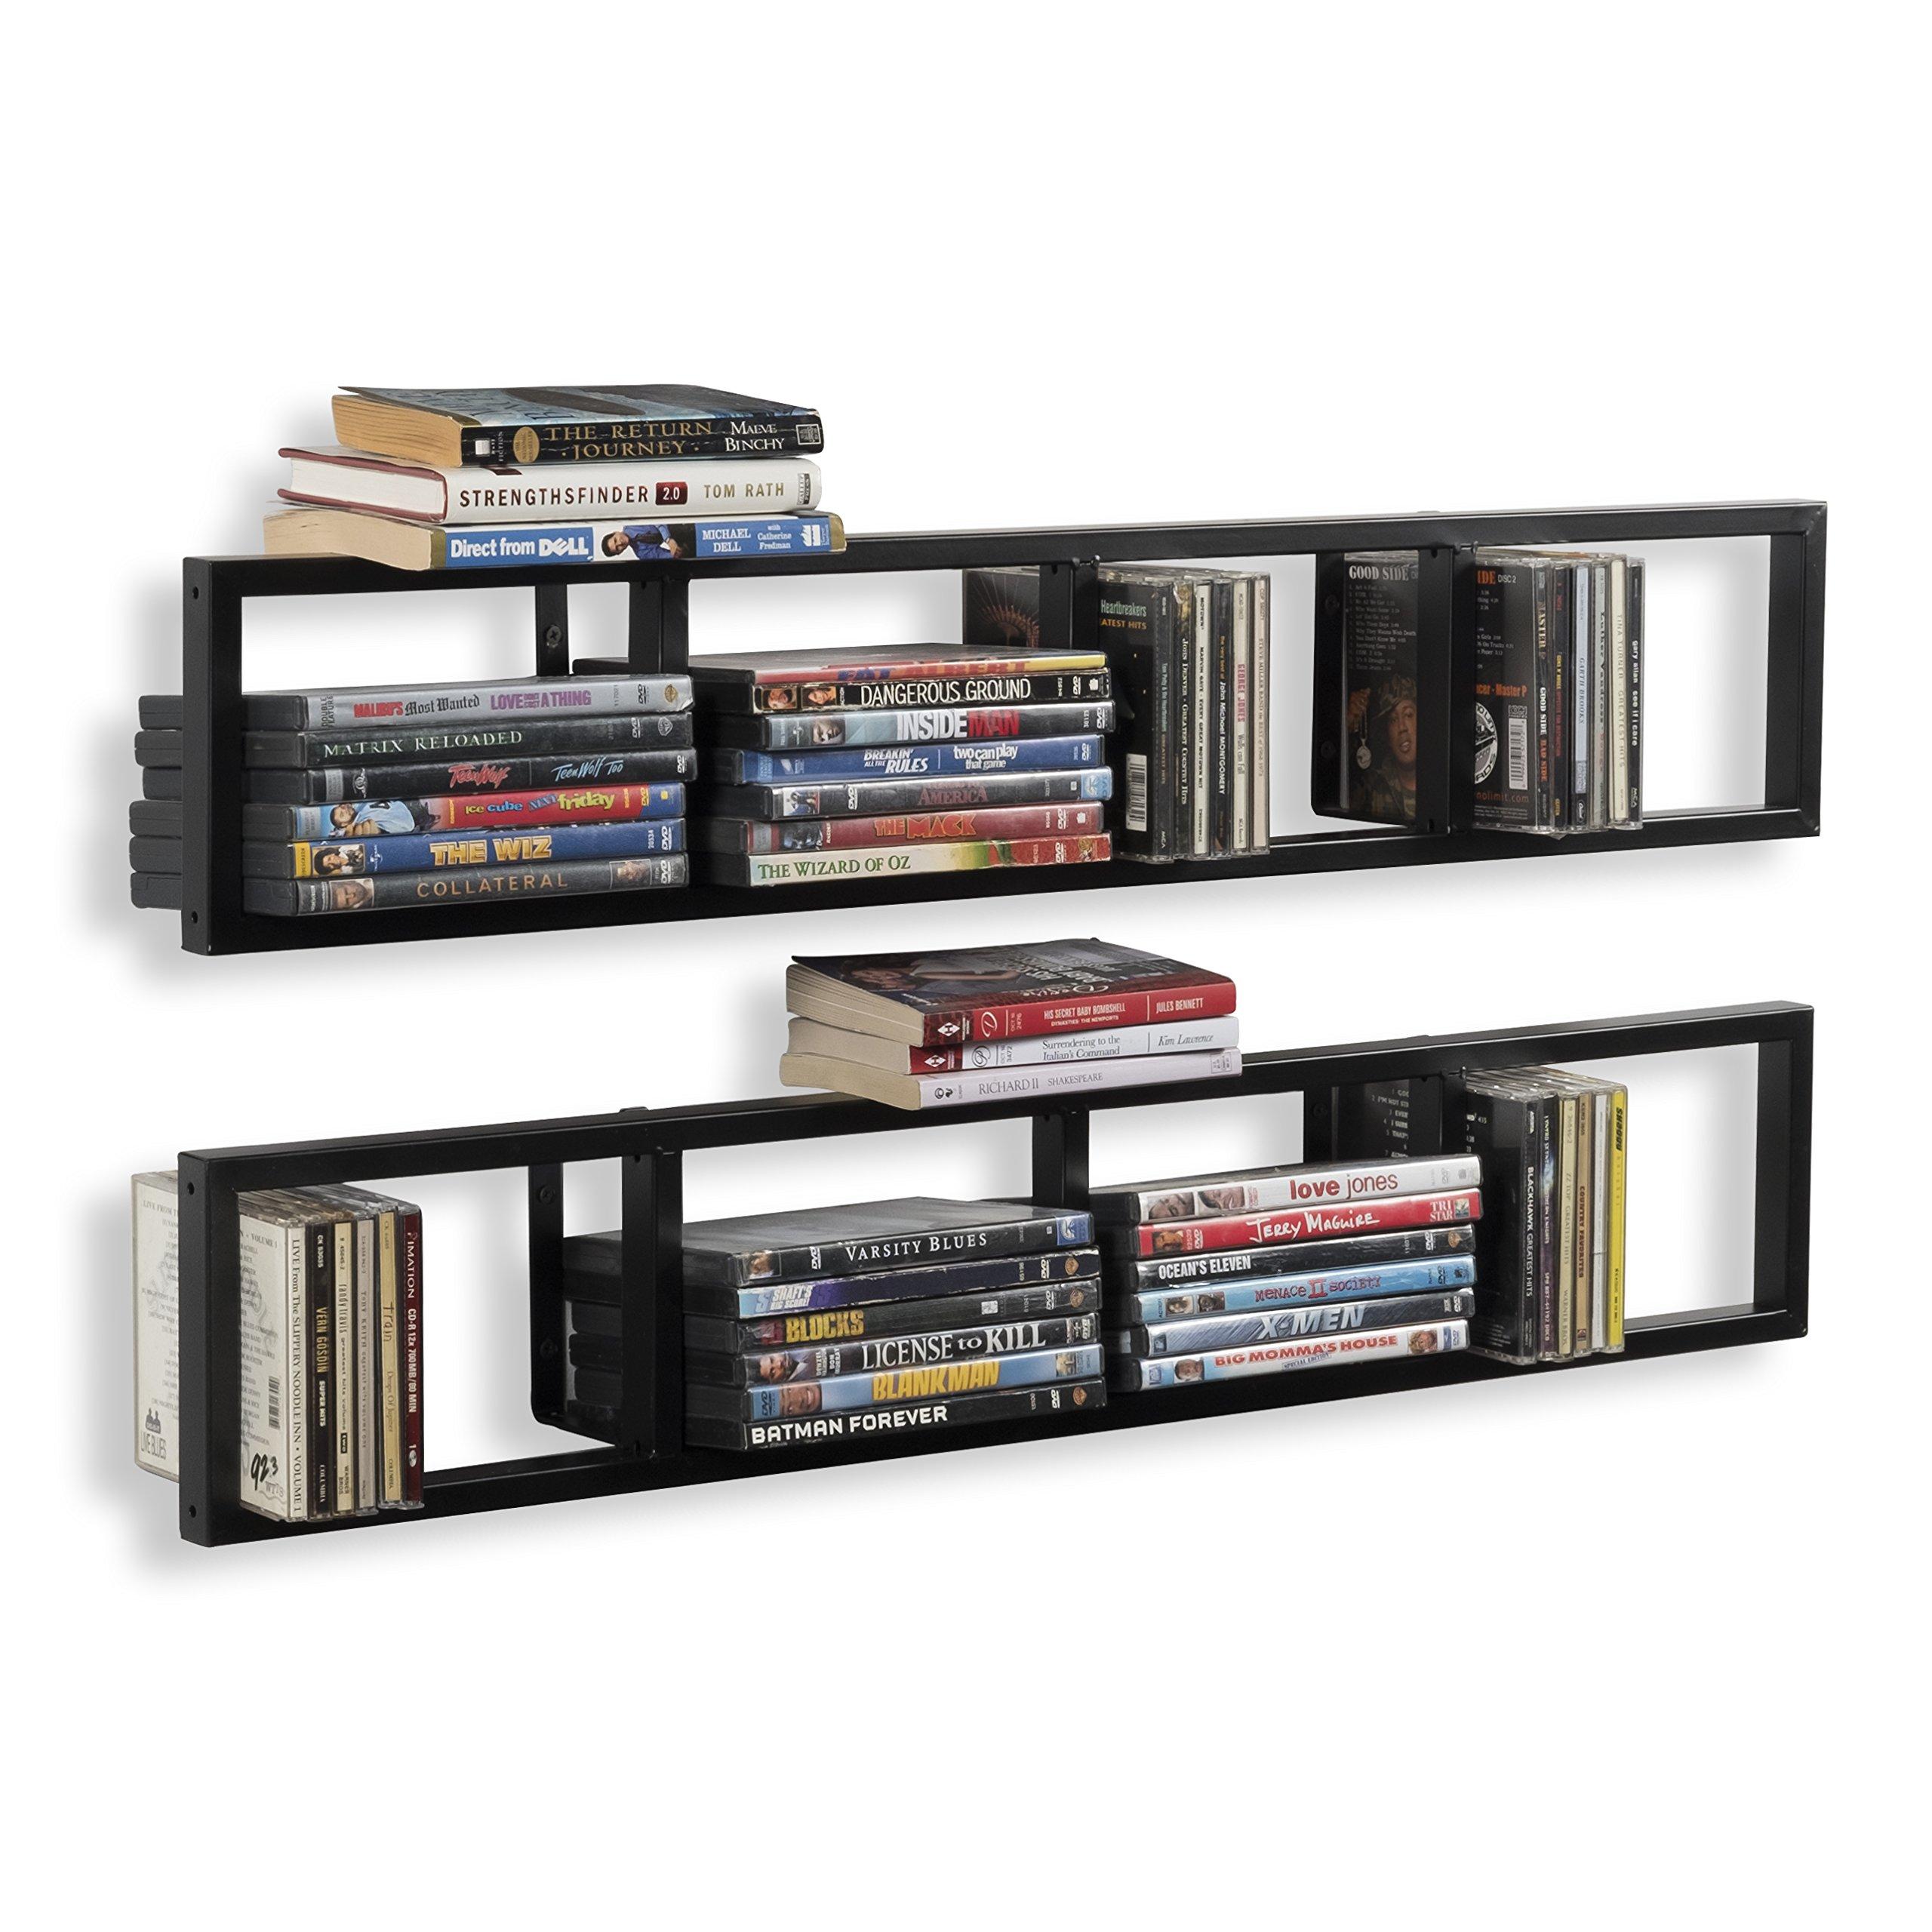 Wall Mount 34 Inch Media Storage Rack CD DVD Organizer Metal Floating Shelf Set of 2 Black by BHG